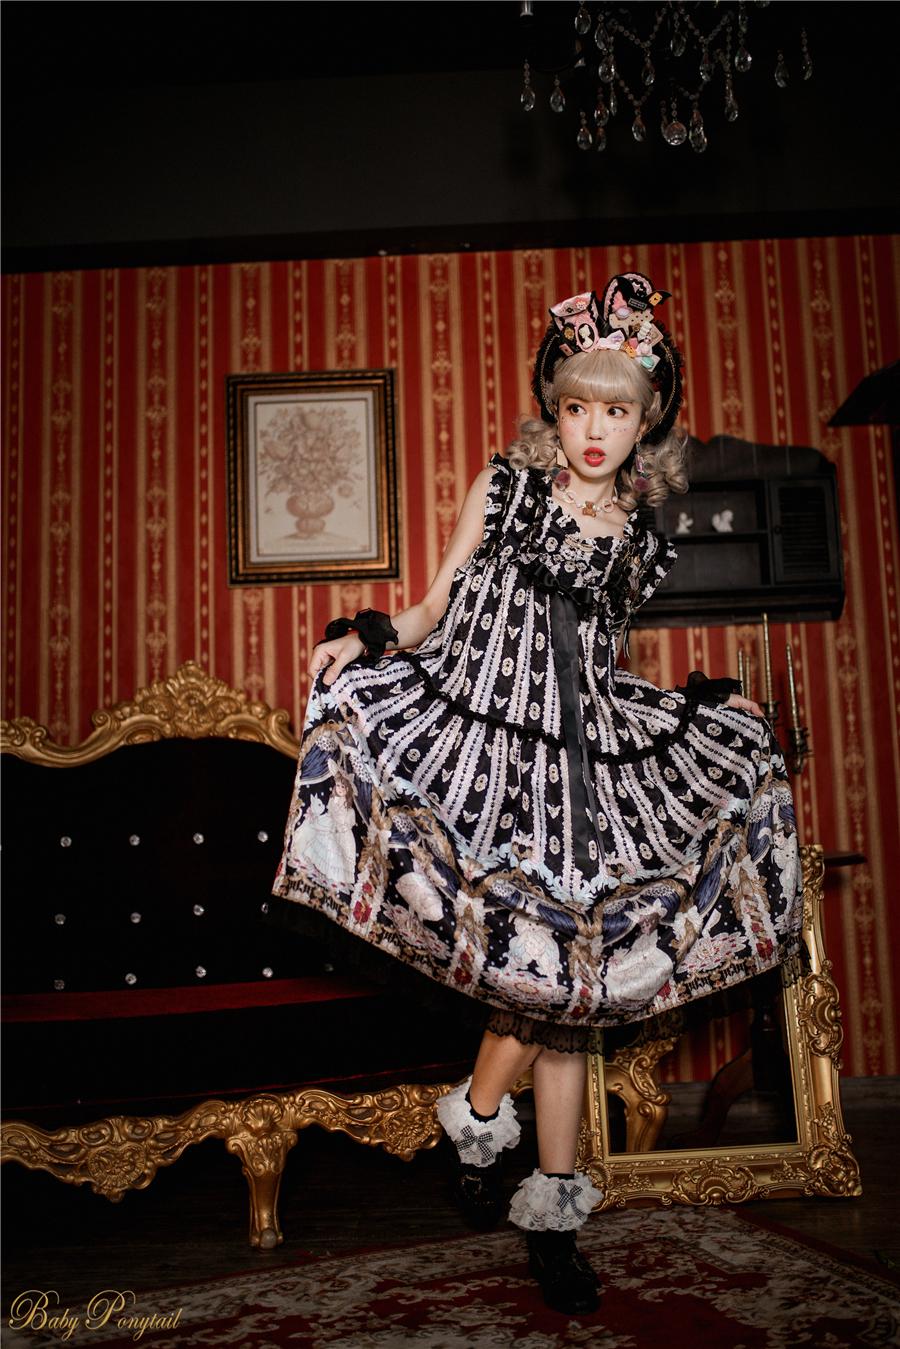 BabyPonytail_Model Photo_My Favorite Companion_NG Black_Kaka_1_2.jpg